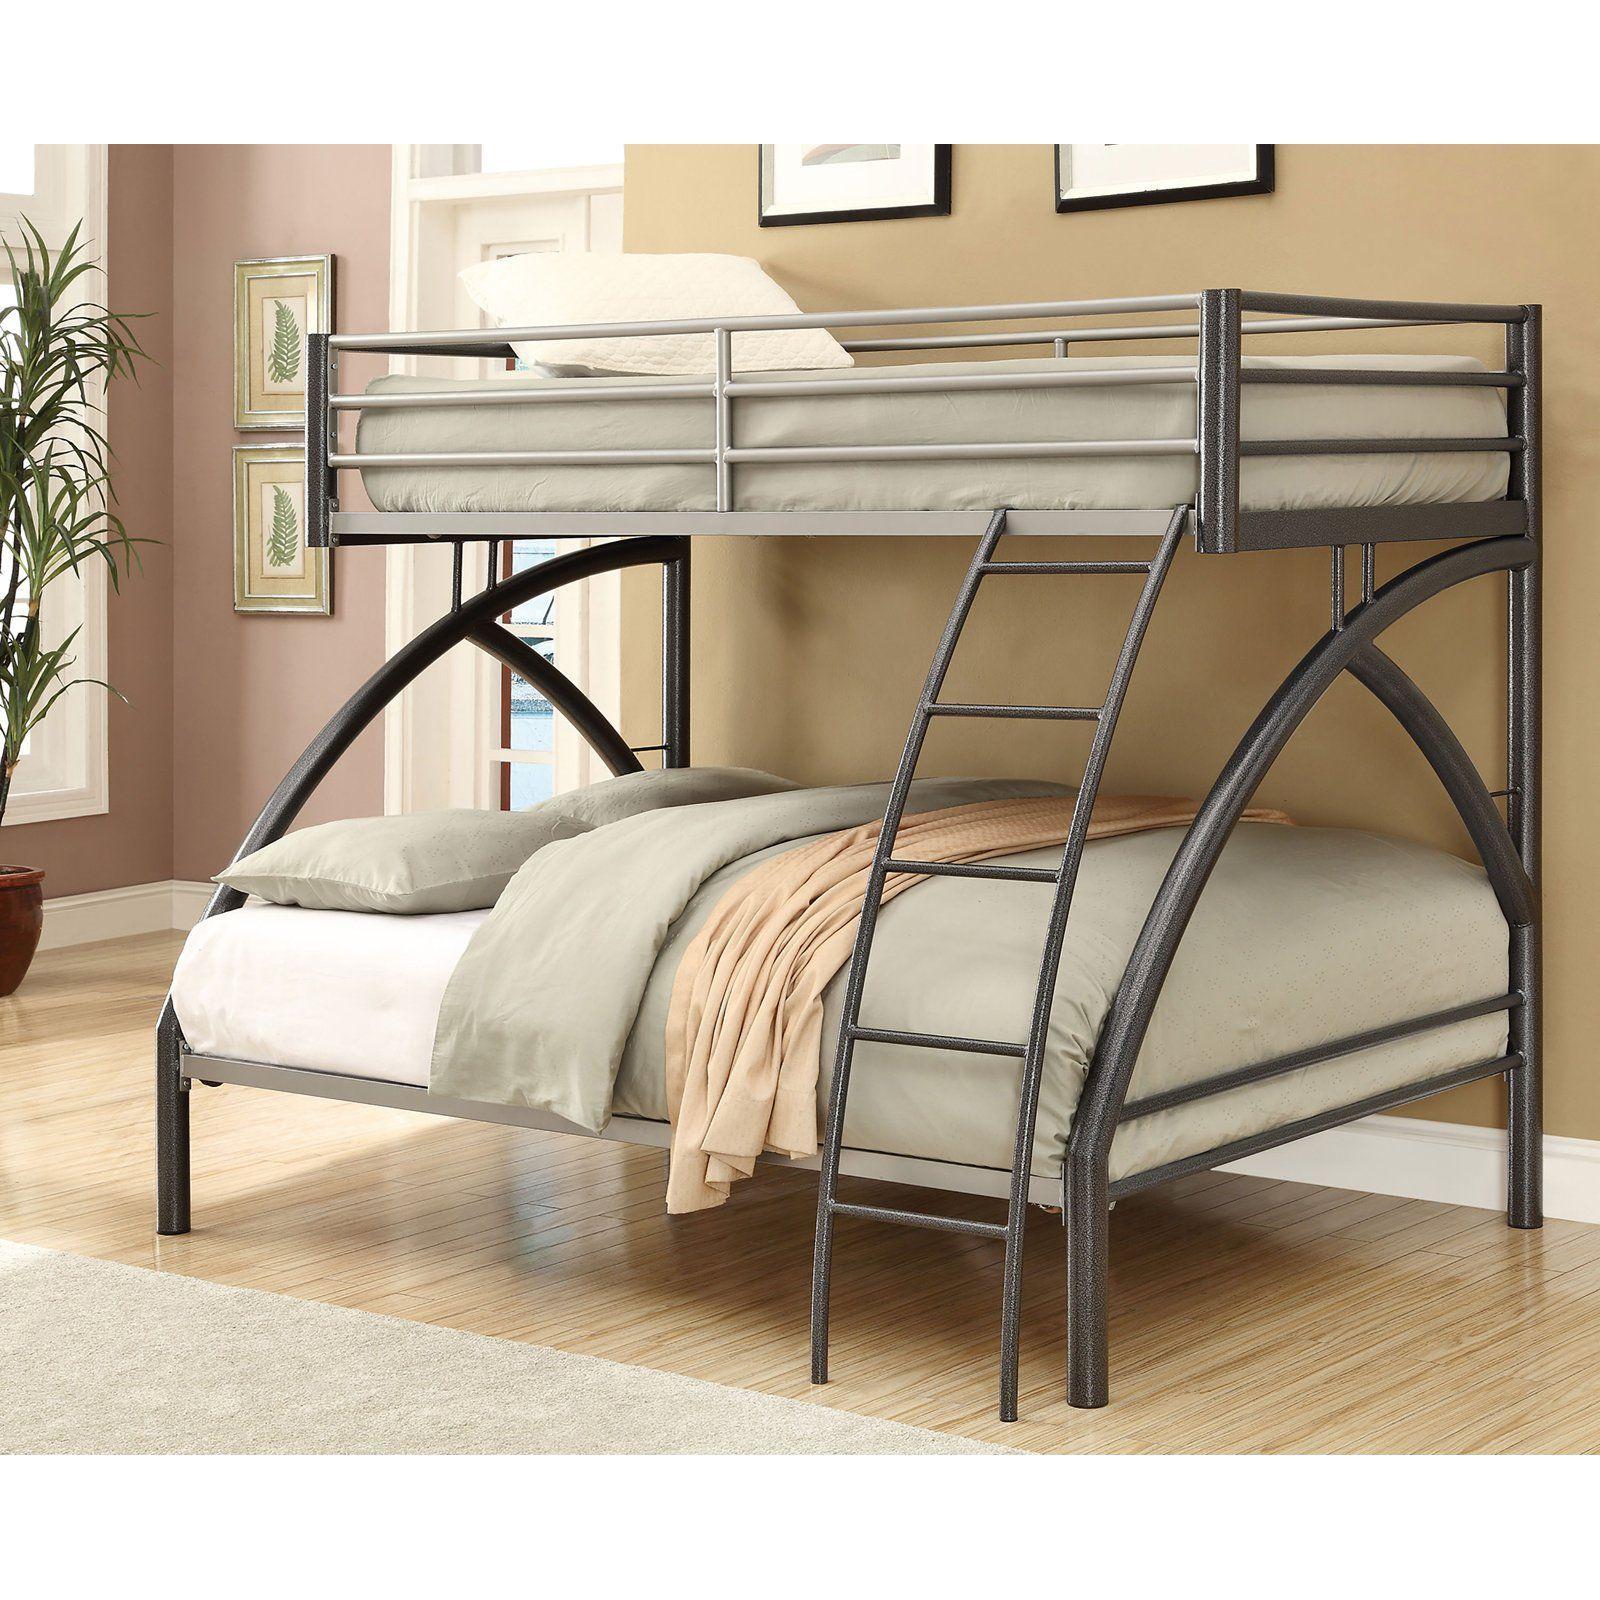 Coaster Furniture Twin over Full Contemporary Bunk Bed - Dark Gun ...